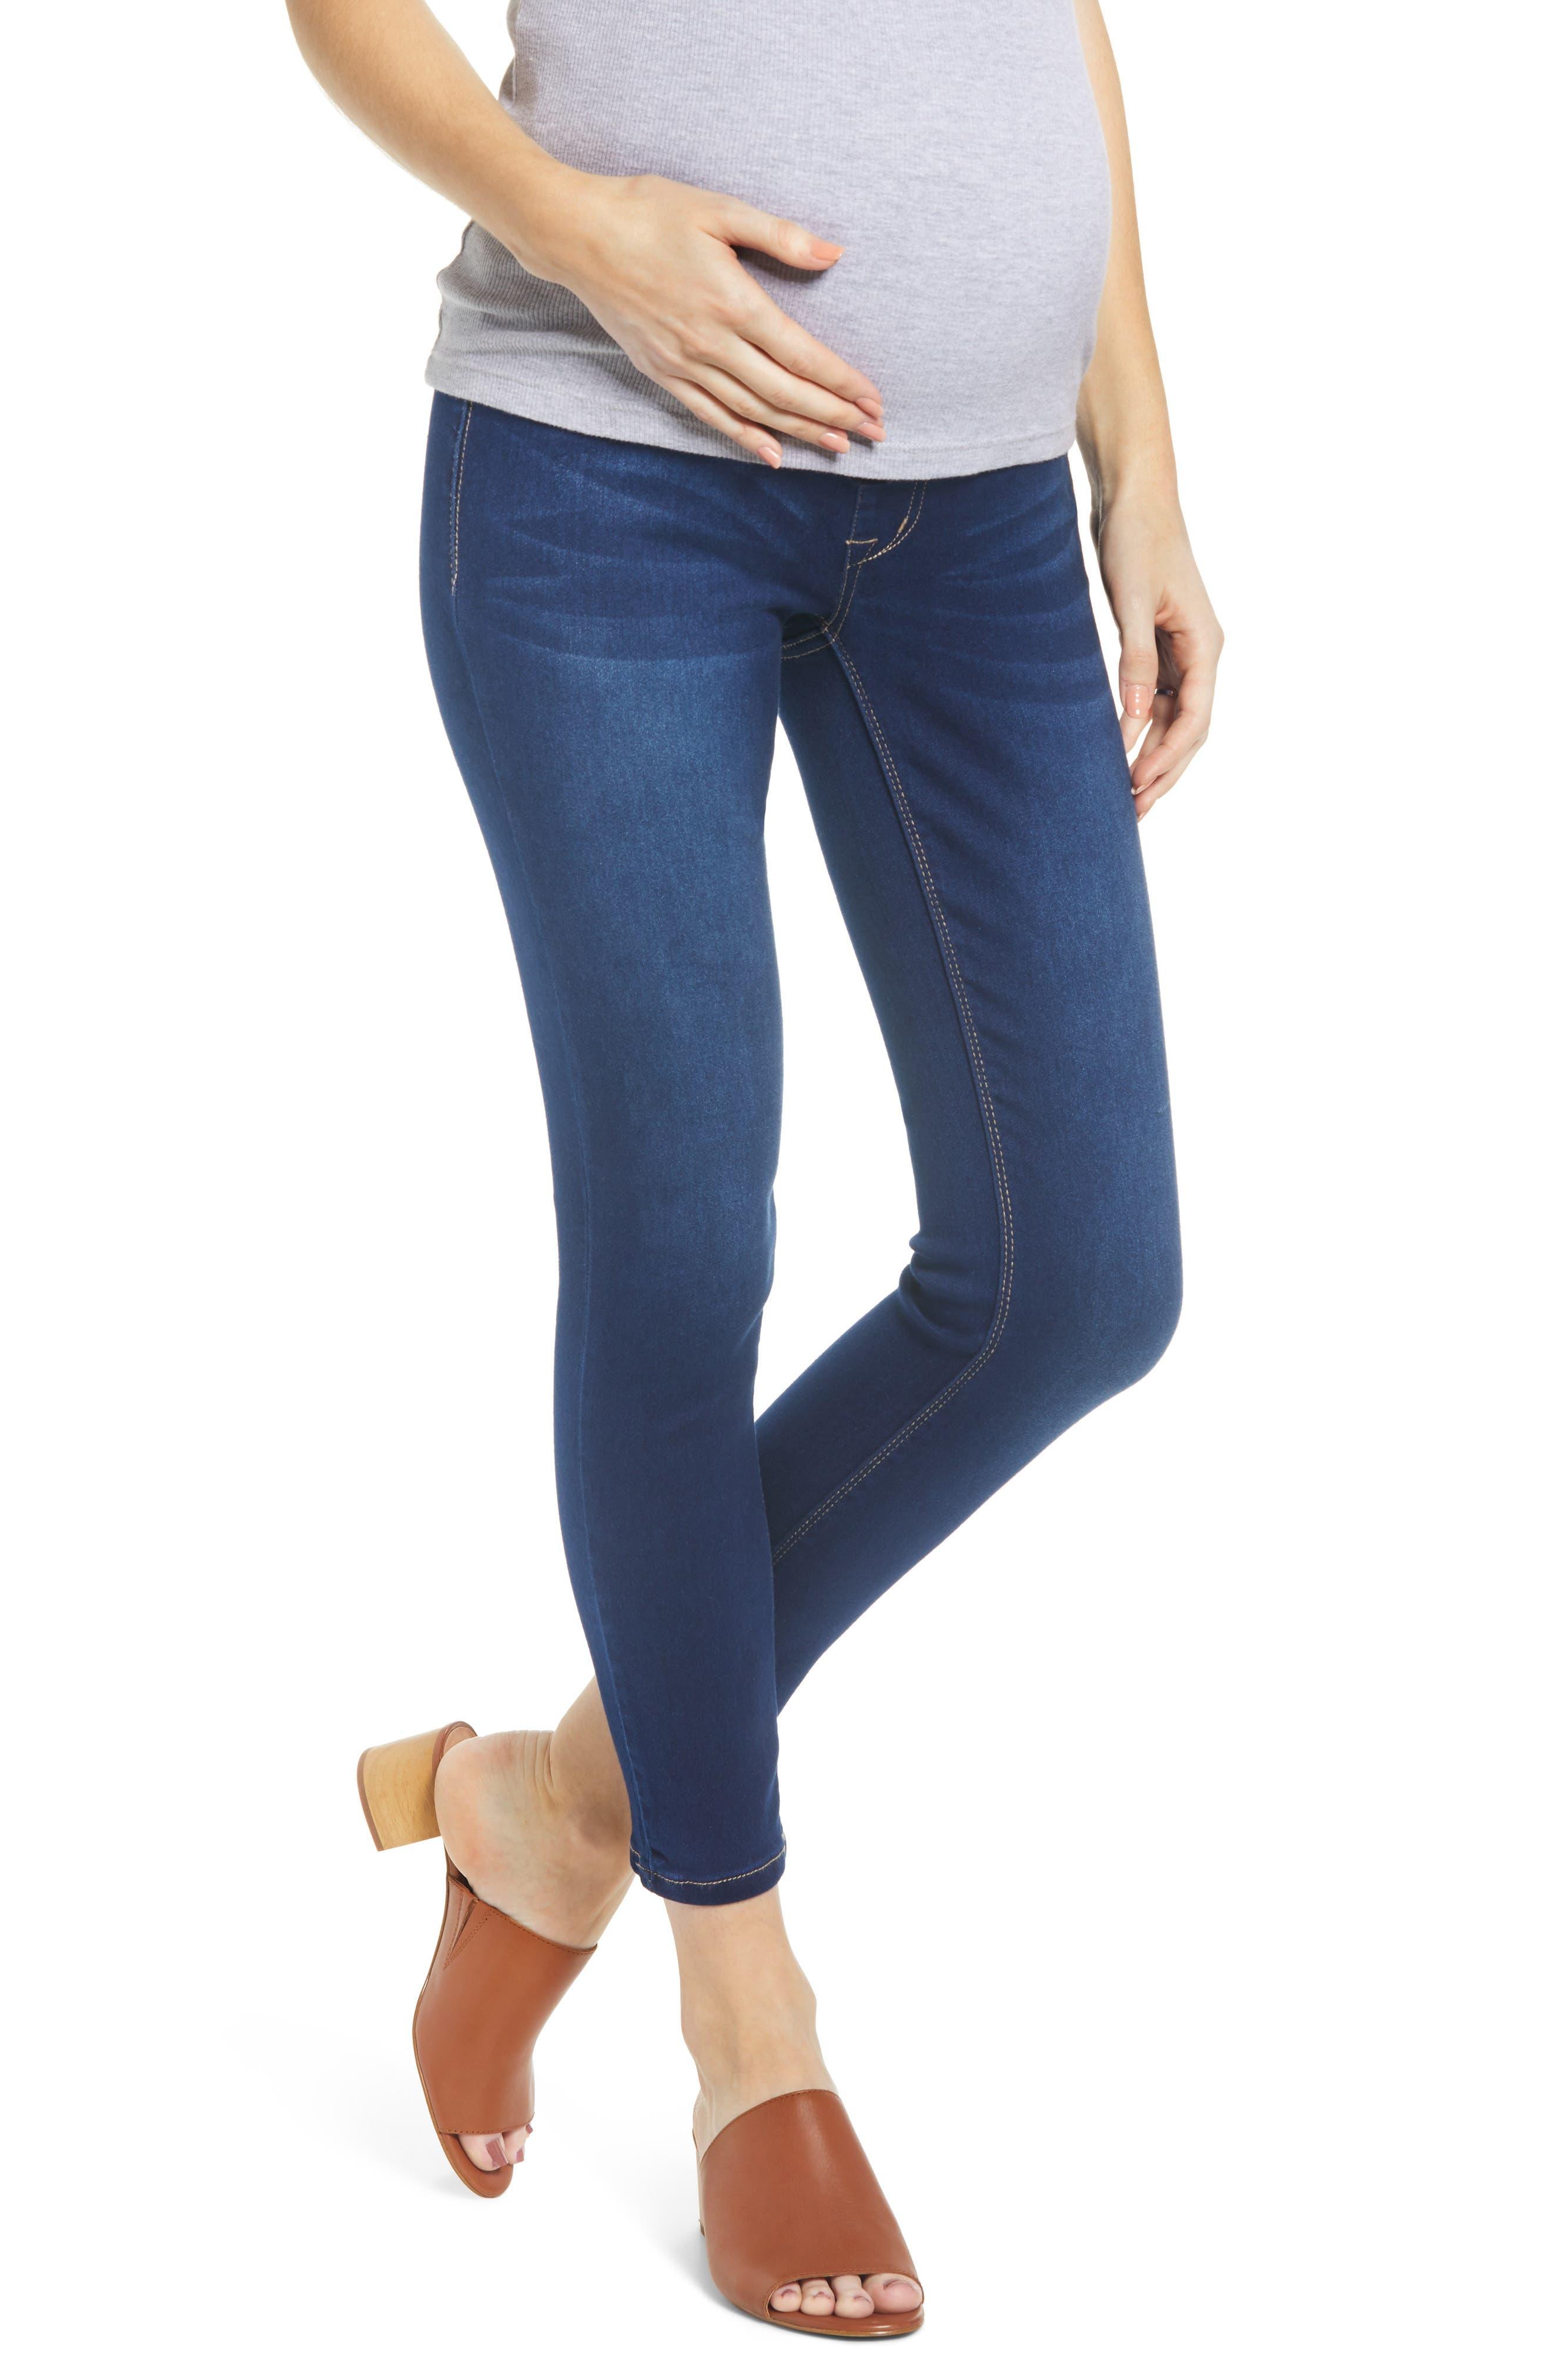 Women's 1822 Denim Butter Ankle Skinny Maternity Jeans